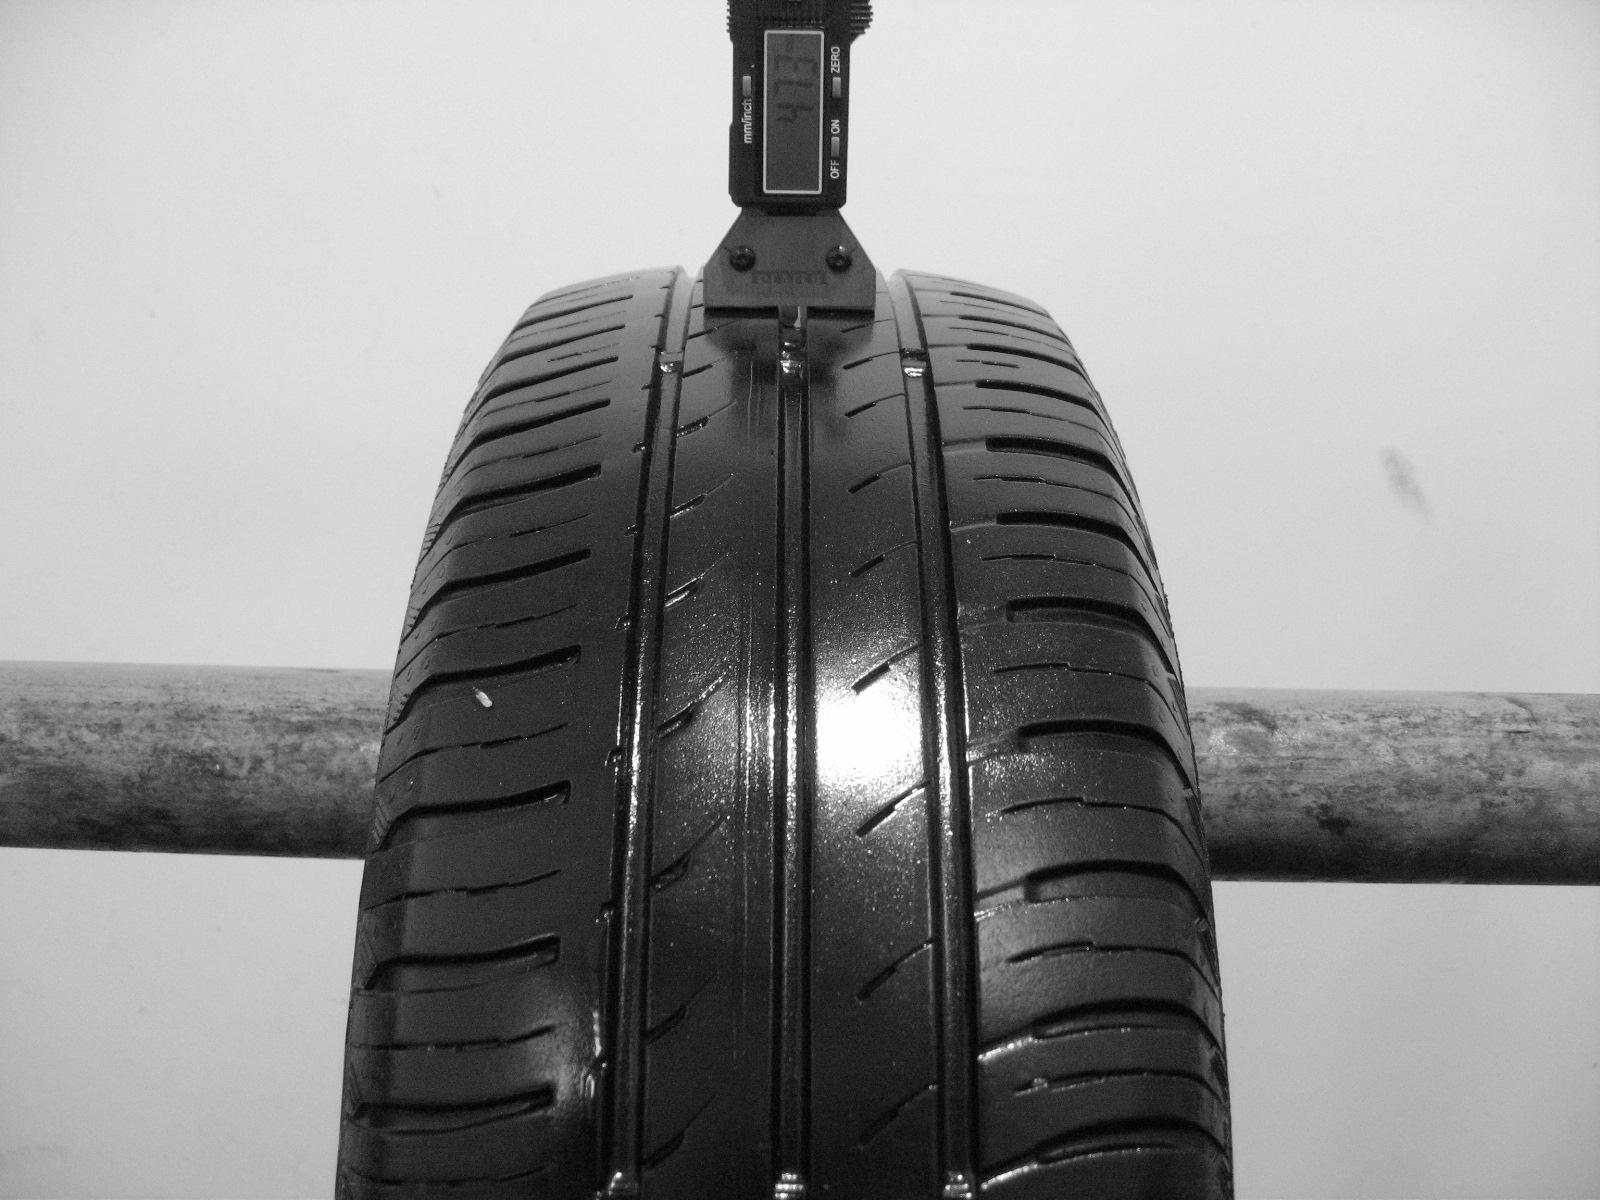 Použité-Pneu-Bazar - 185/70 R14 CONTINENTAL CONTIECOCONTACT 3 -kusovka-rezerva 4mm